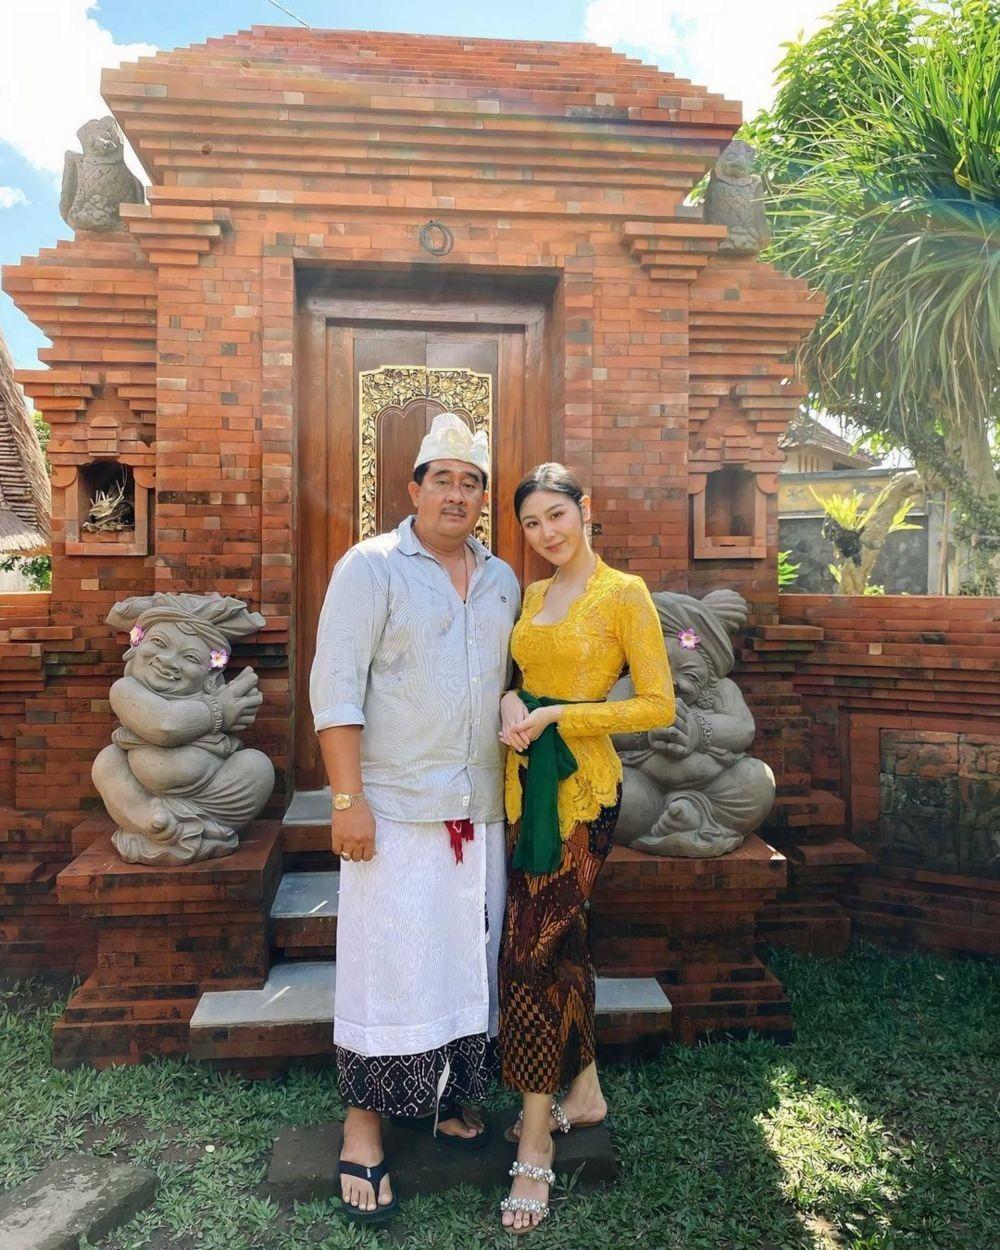 Sambut Hari Raya Galungan, Begini Gaya Elegan Artis Pakai Kebaya Bali